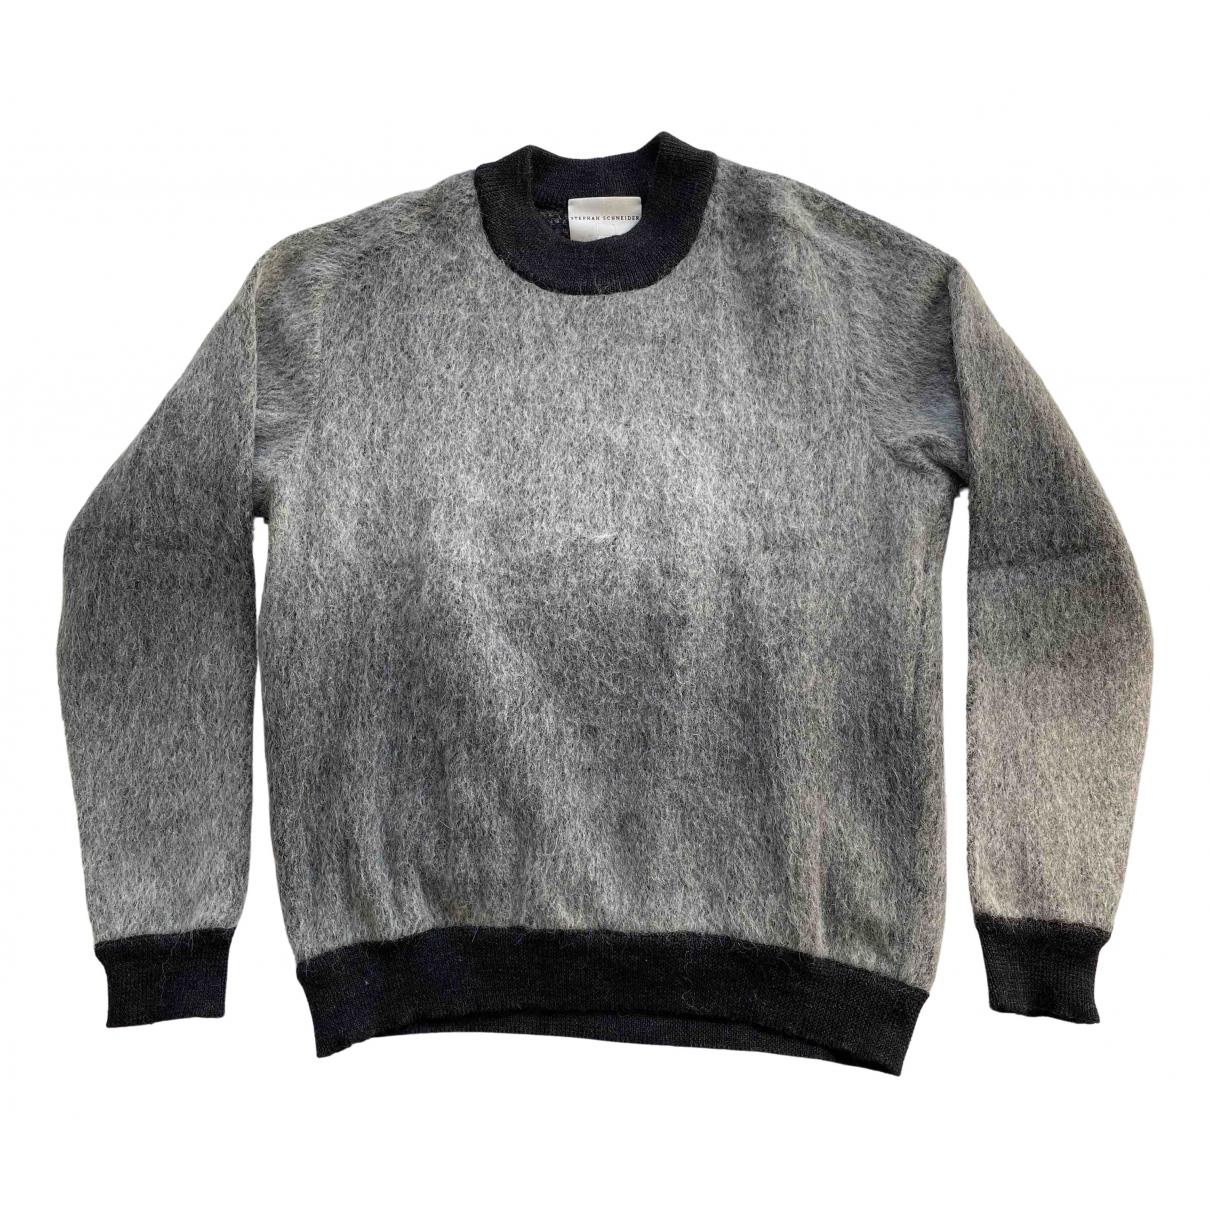 Stephan Schneider \N Grey Knitwear & Sweatshirts for Men S International